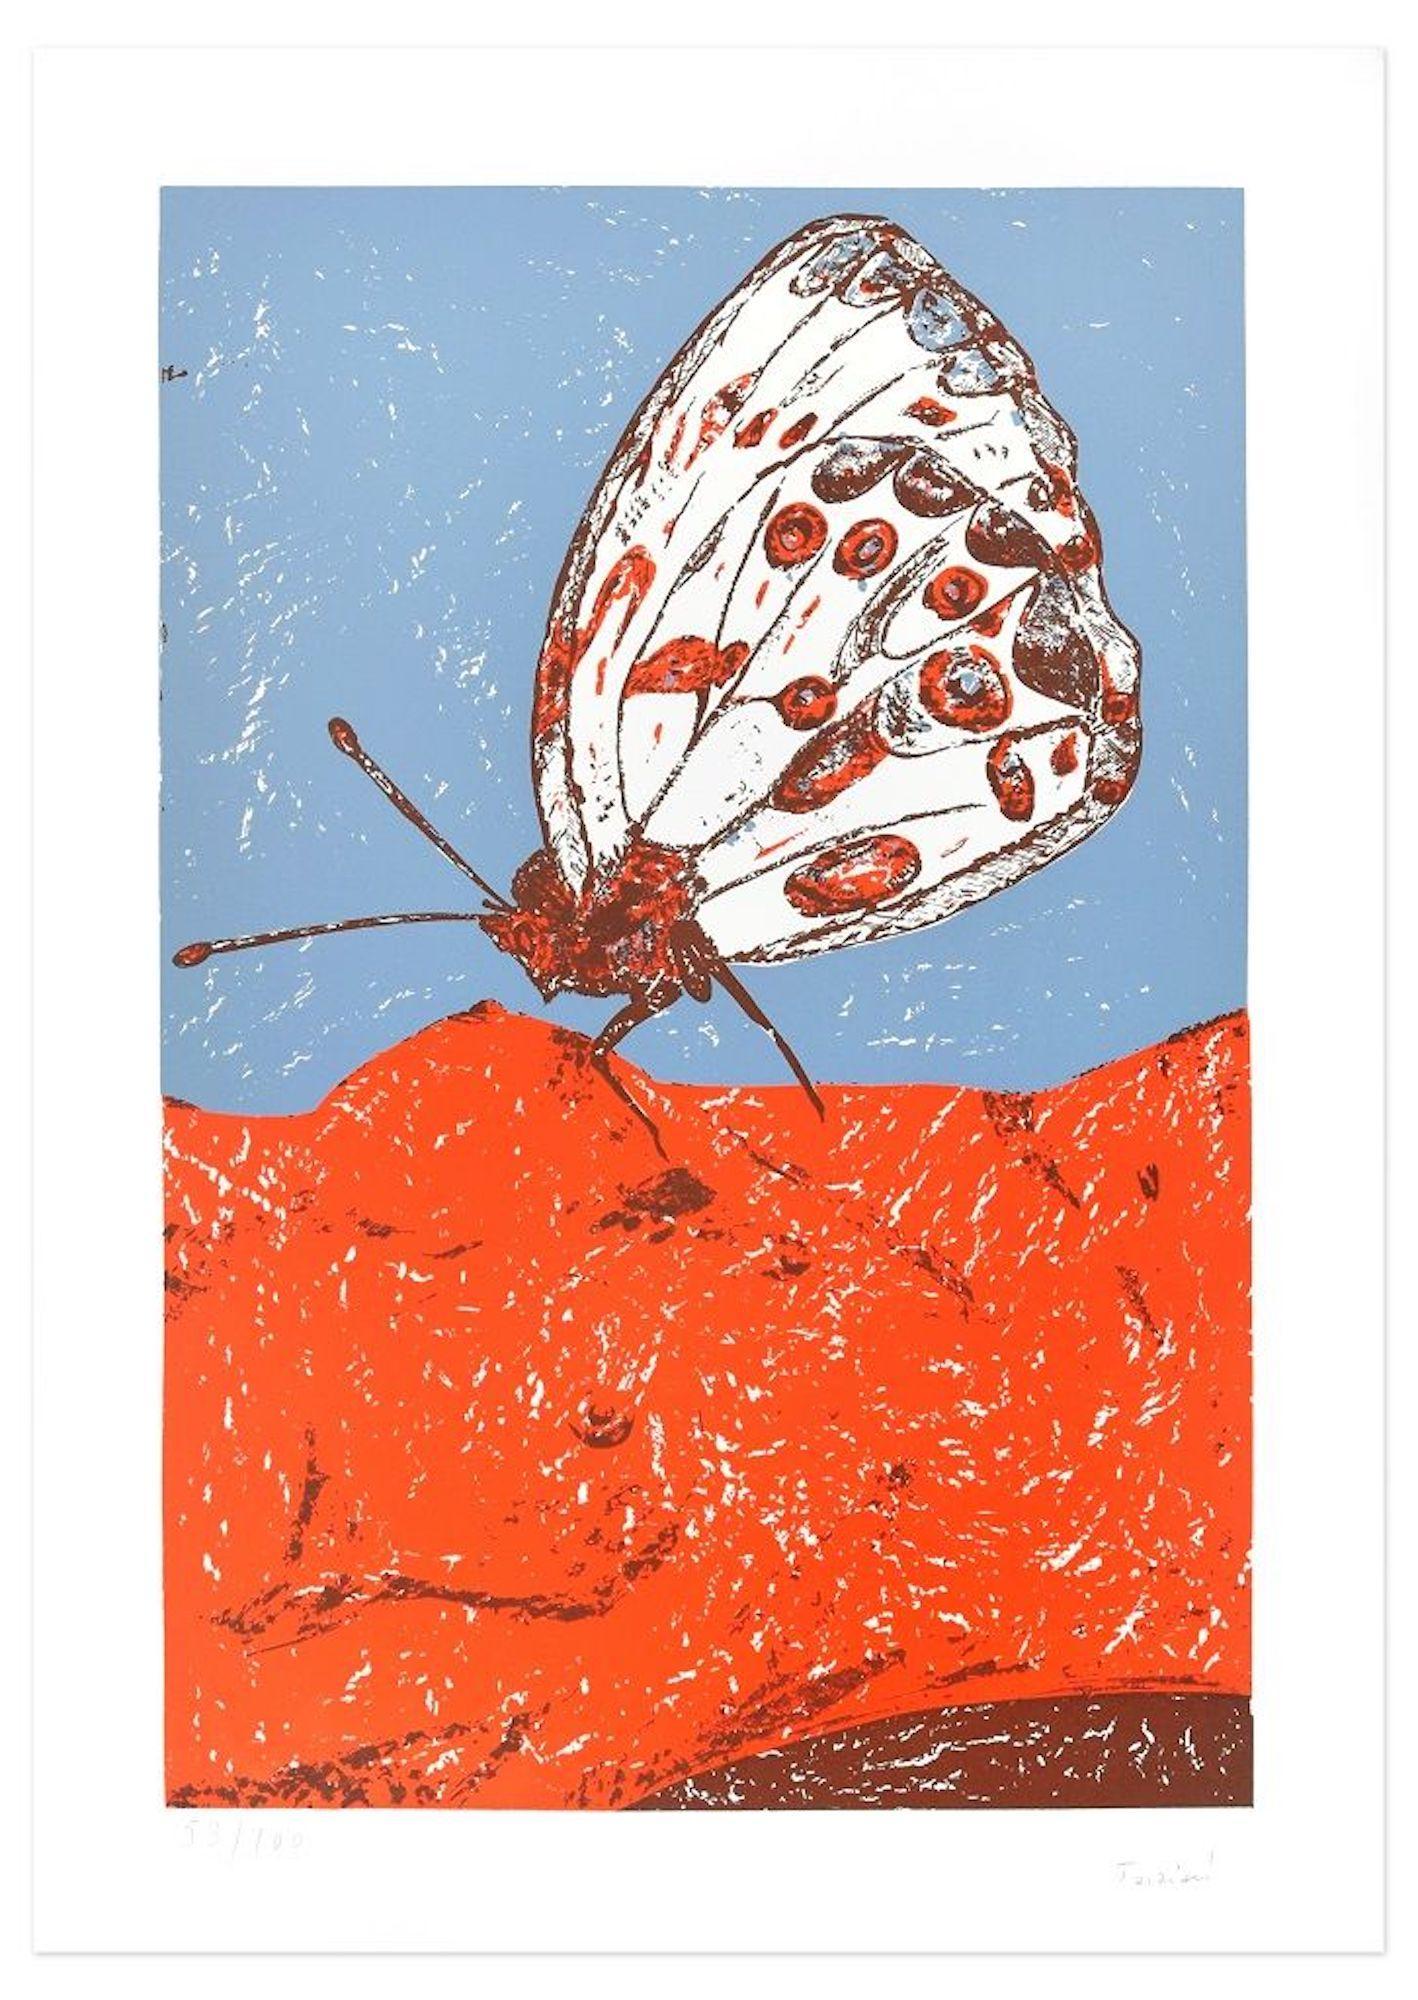 Butterfly - Original Lithograph by Nino Terziari - 1970s